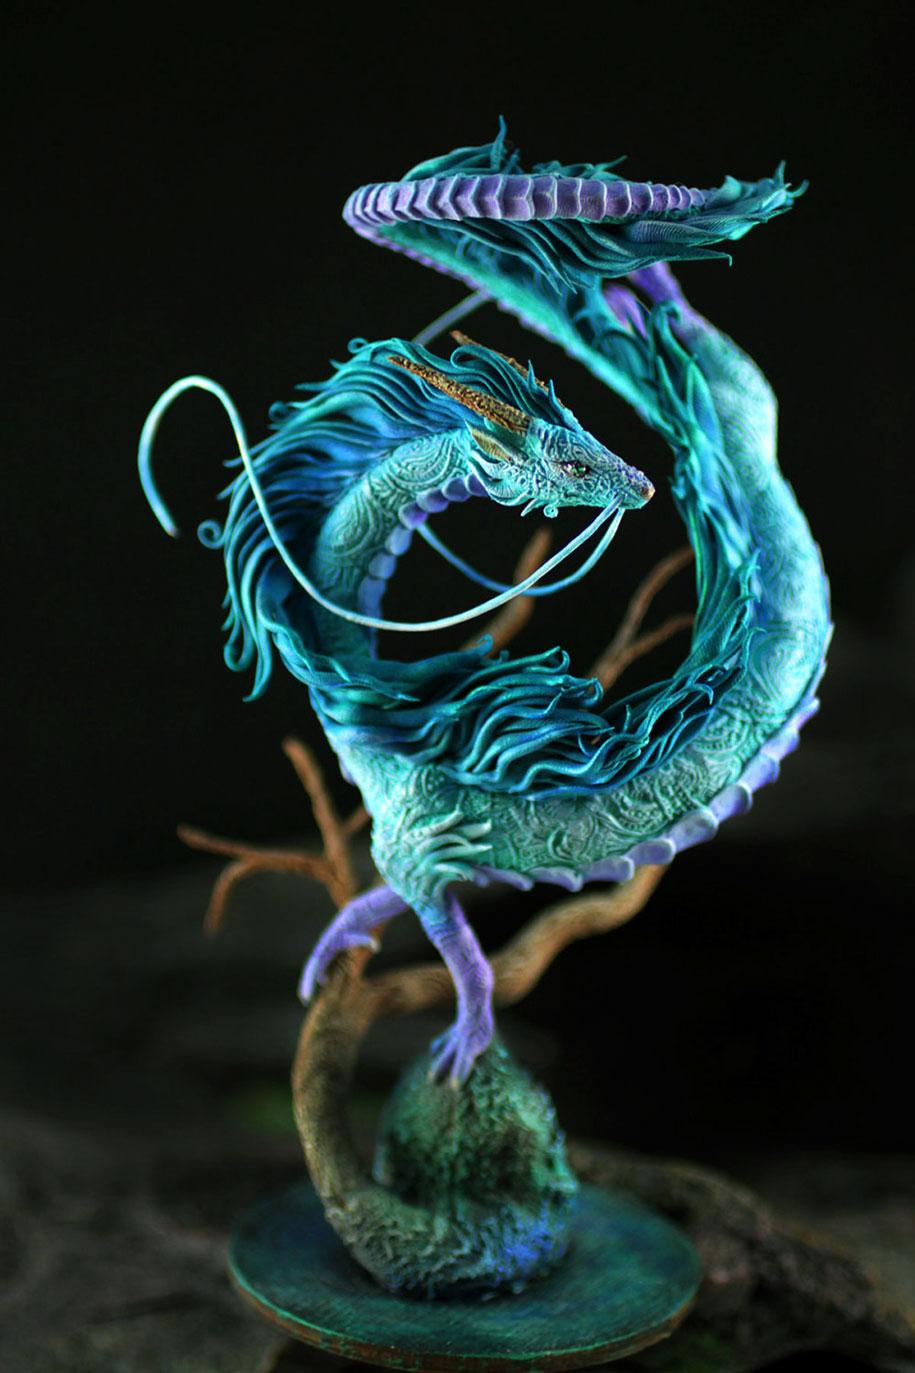 fantasy-animal-sculptures-demiurgus-dreams-evgeny-hontor-4